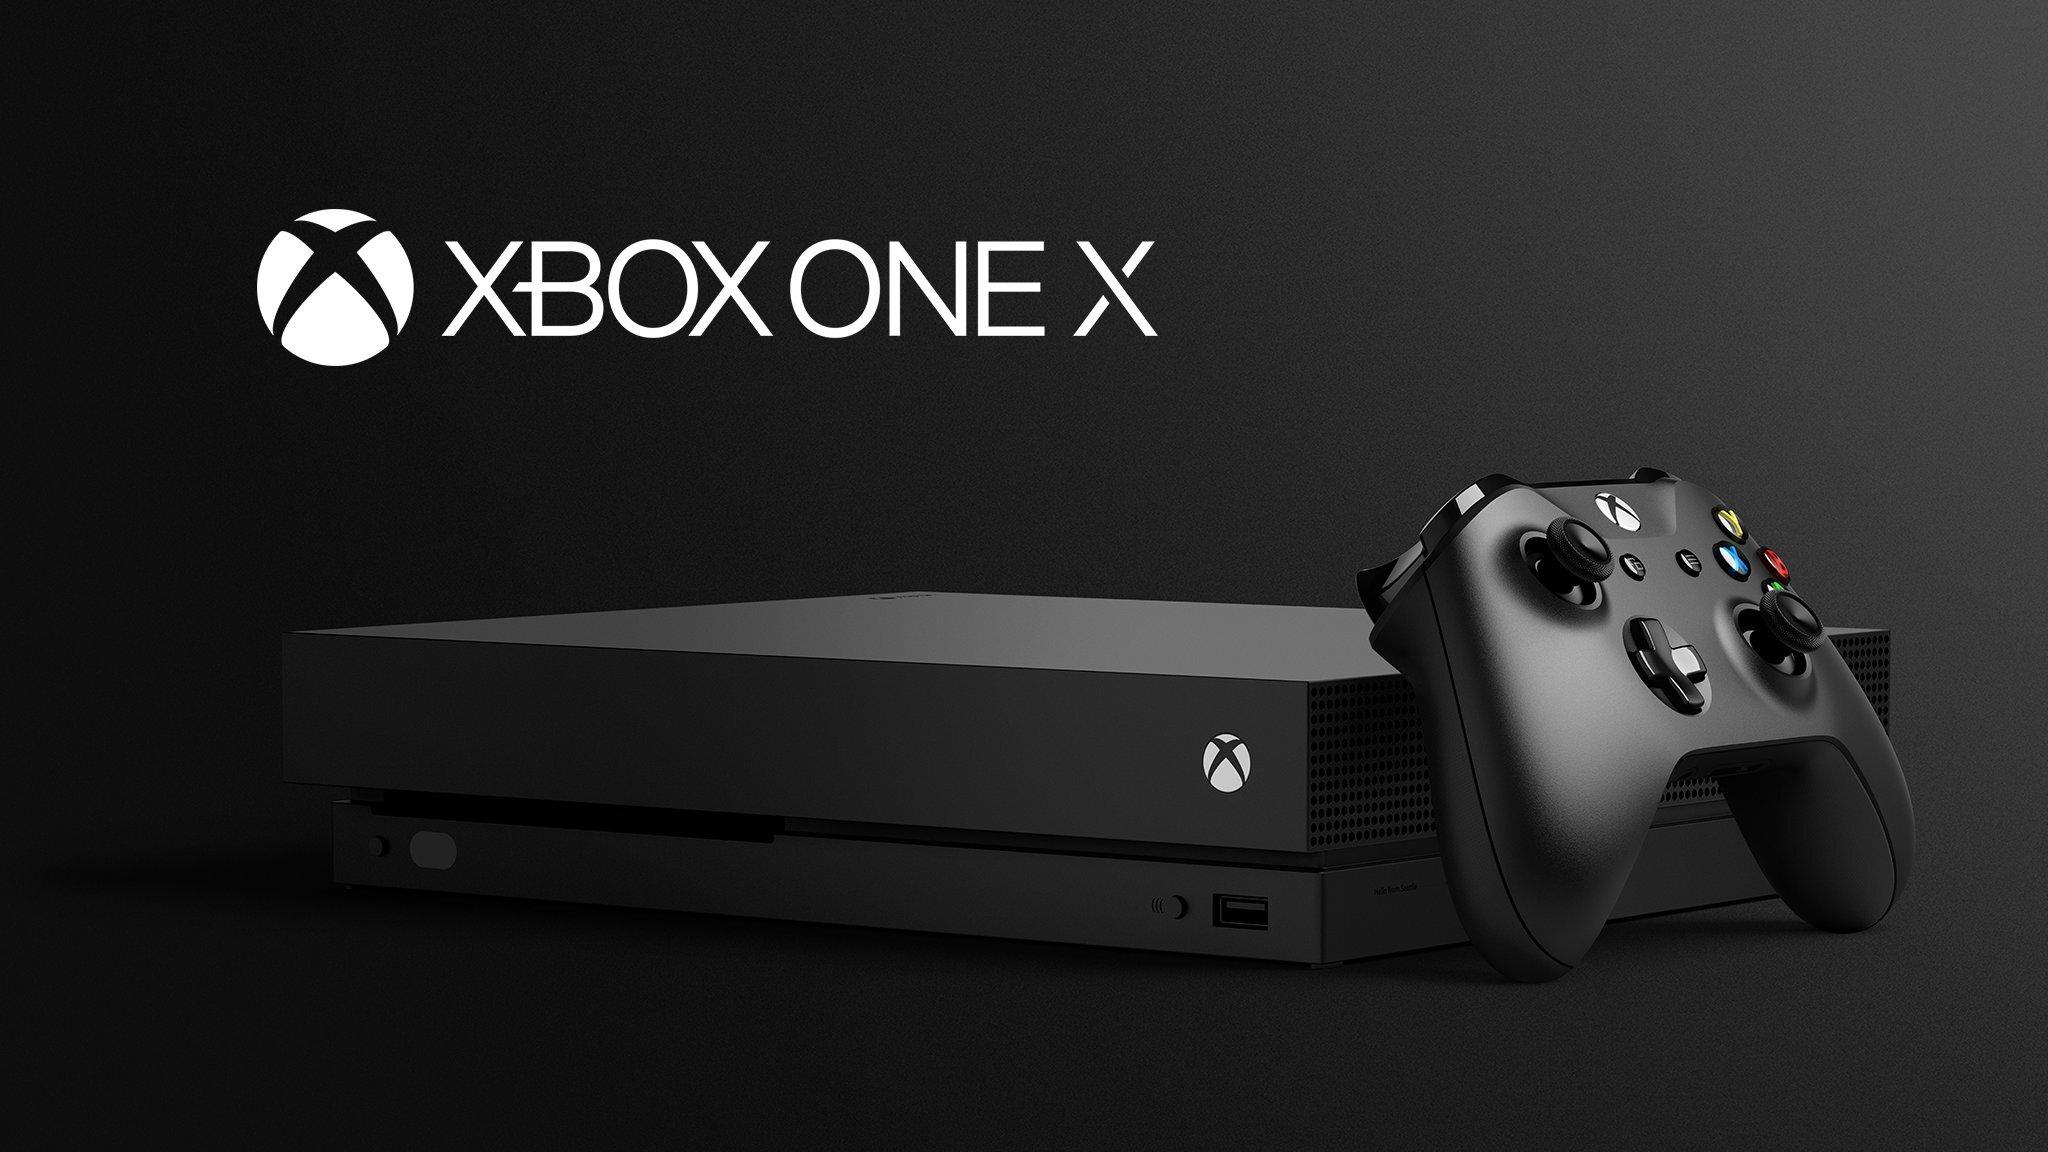 Máy chơi game Xbox one X